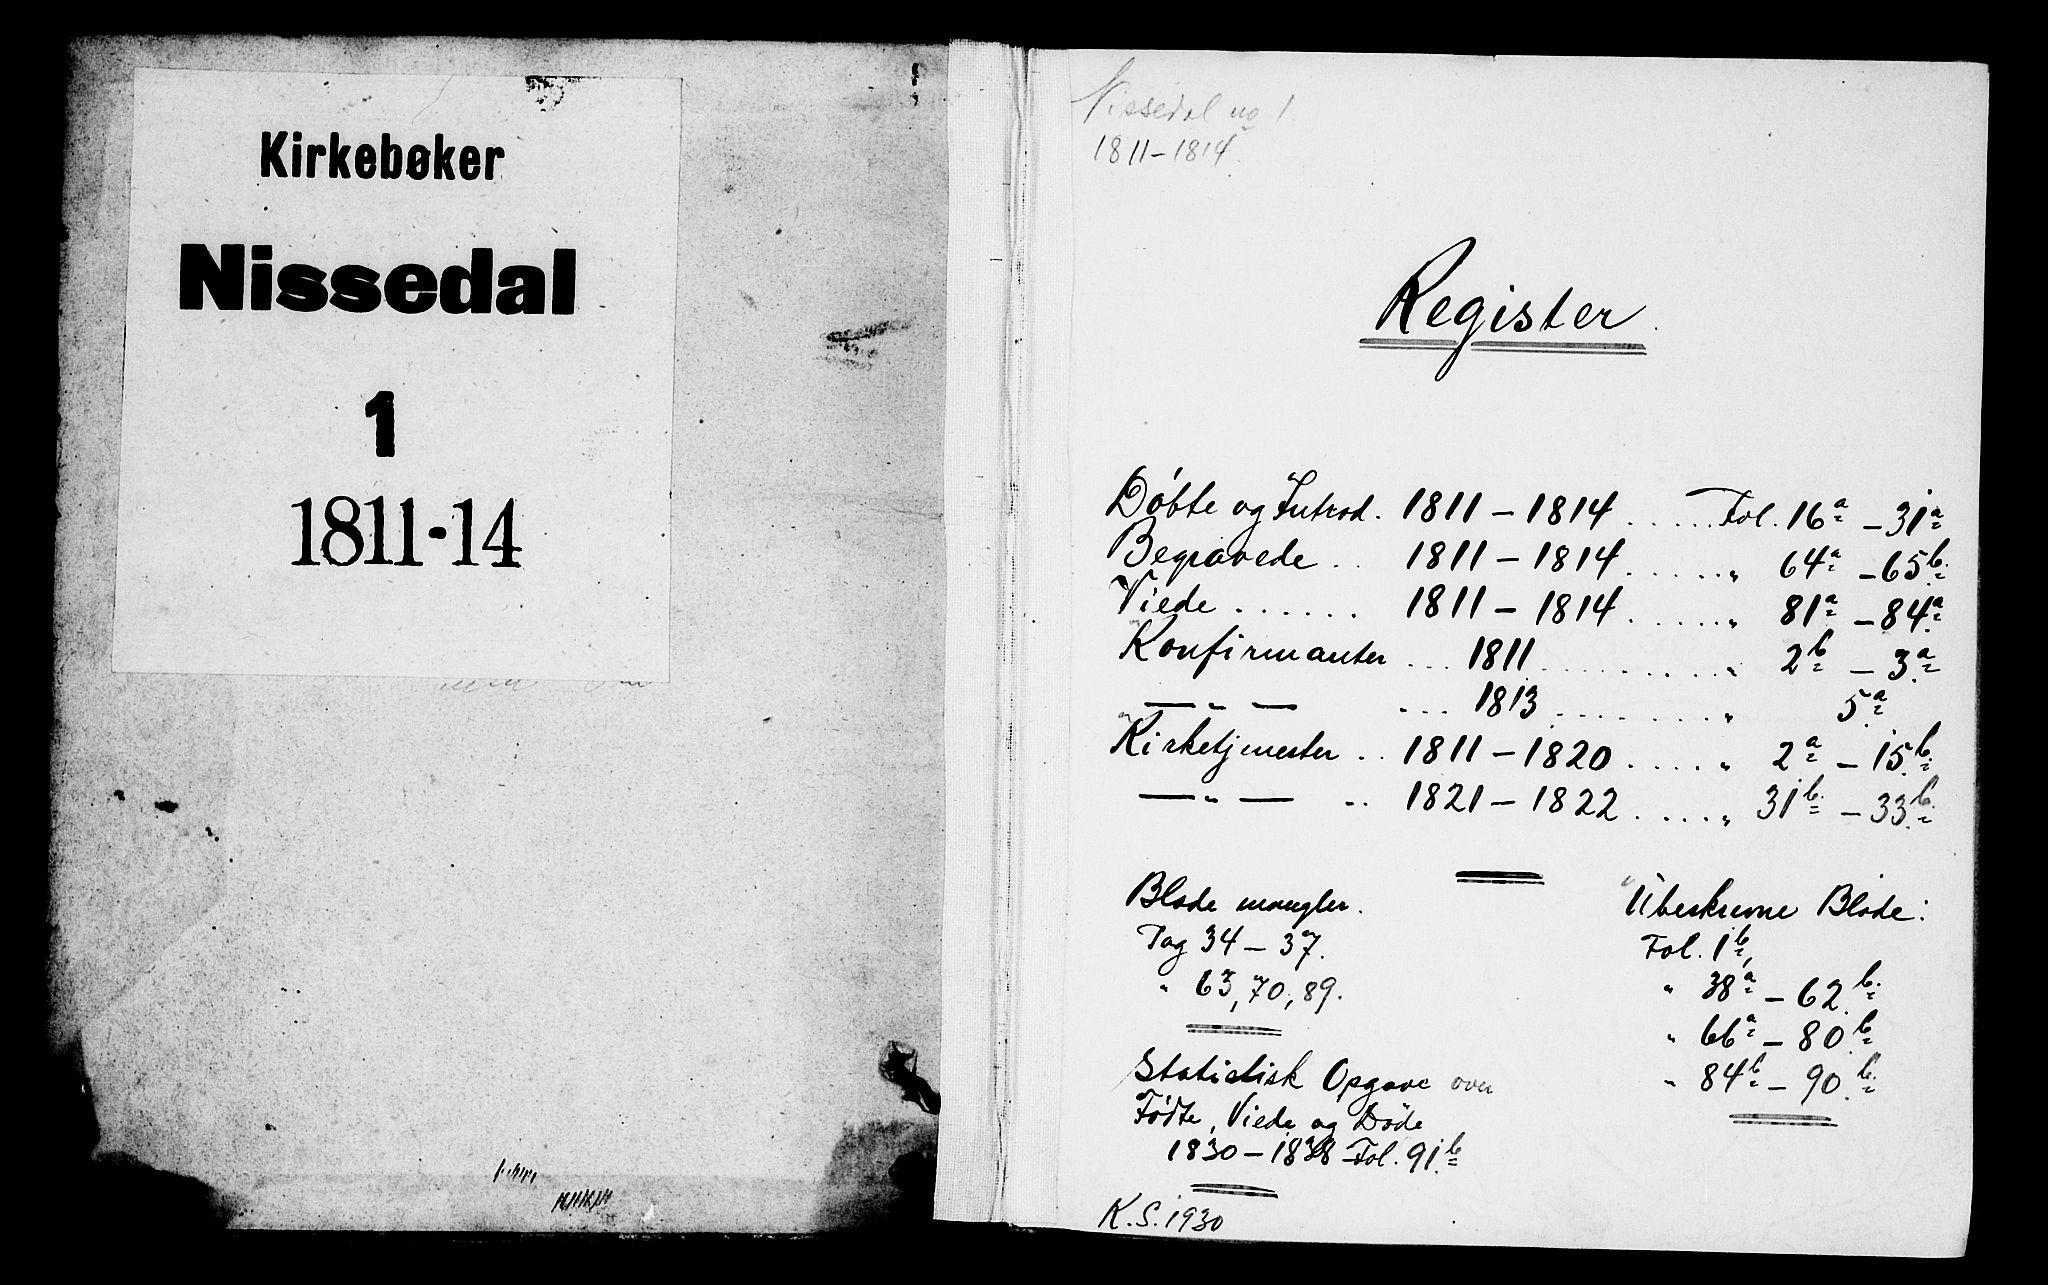 SAKO, Nissedal kirkebøker, F/Fa/L0001: Ministerialbok nr. I 1, 1811-1814